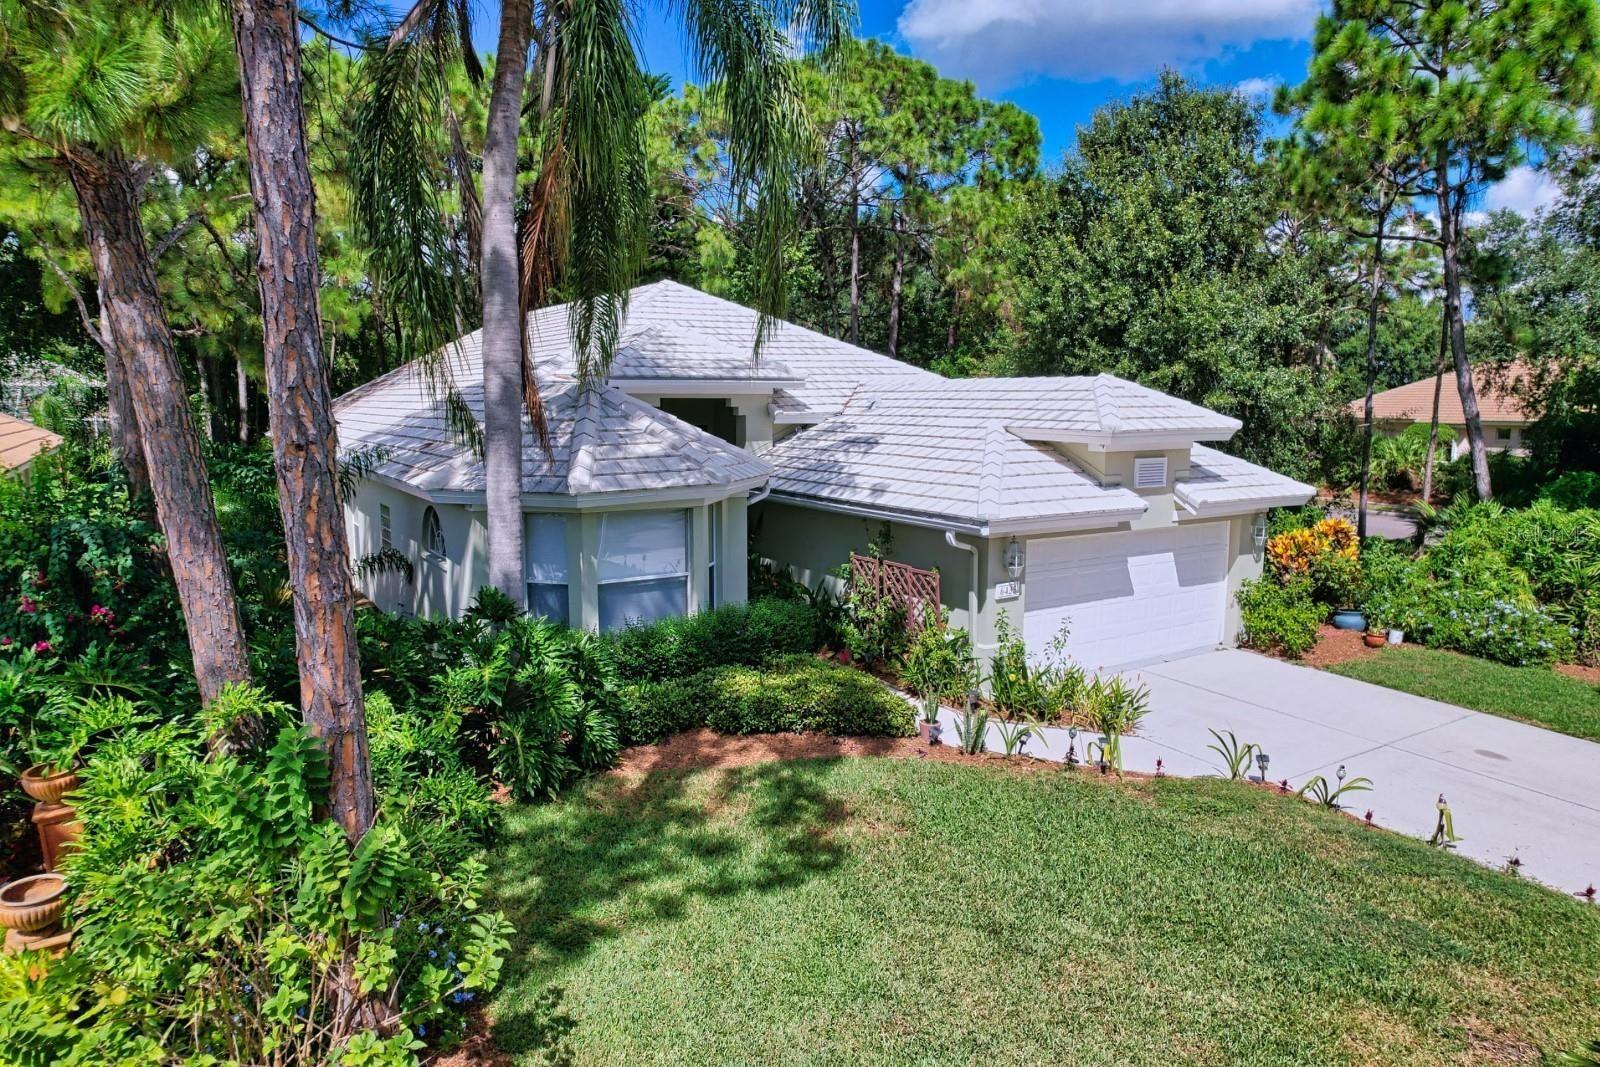 6435 BERKSHIRE PLACE, University Park, FL 34201 - #: A4515015